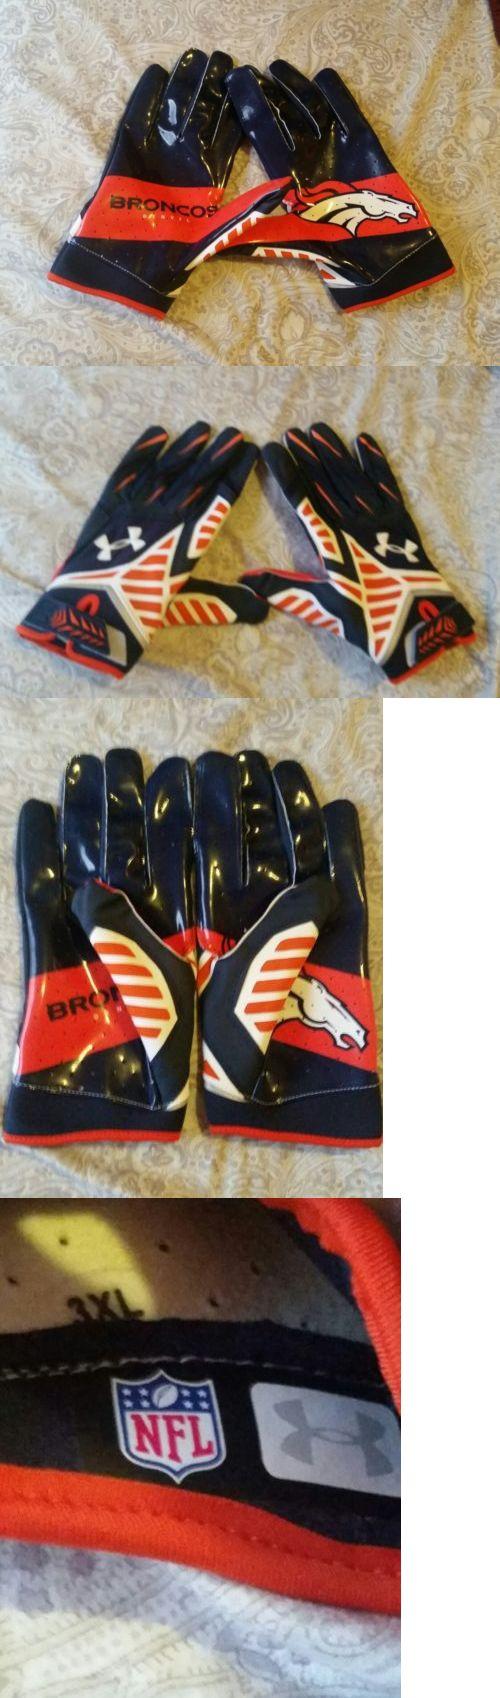 Gloves 159114: Under Armour Nitro Football Gloves Nfl Denver Broncos -> BUY IT NOW ONLY: $30 on eBay!